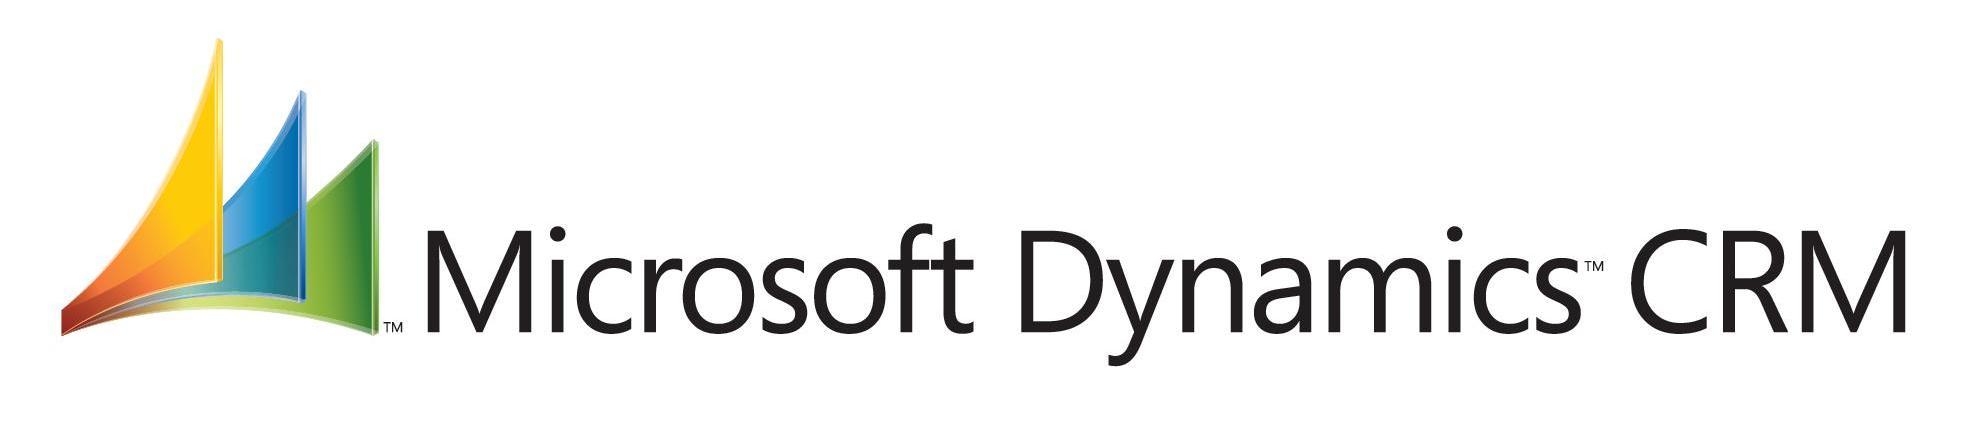 11795452-microsoft-dynamics-crm